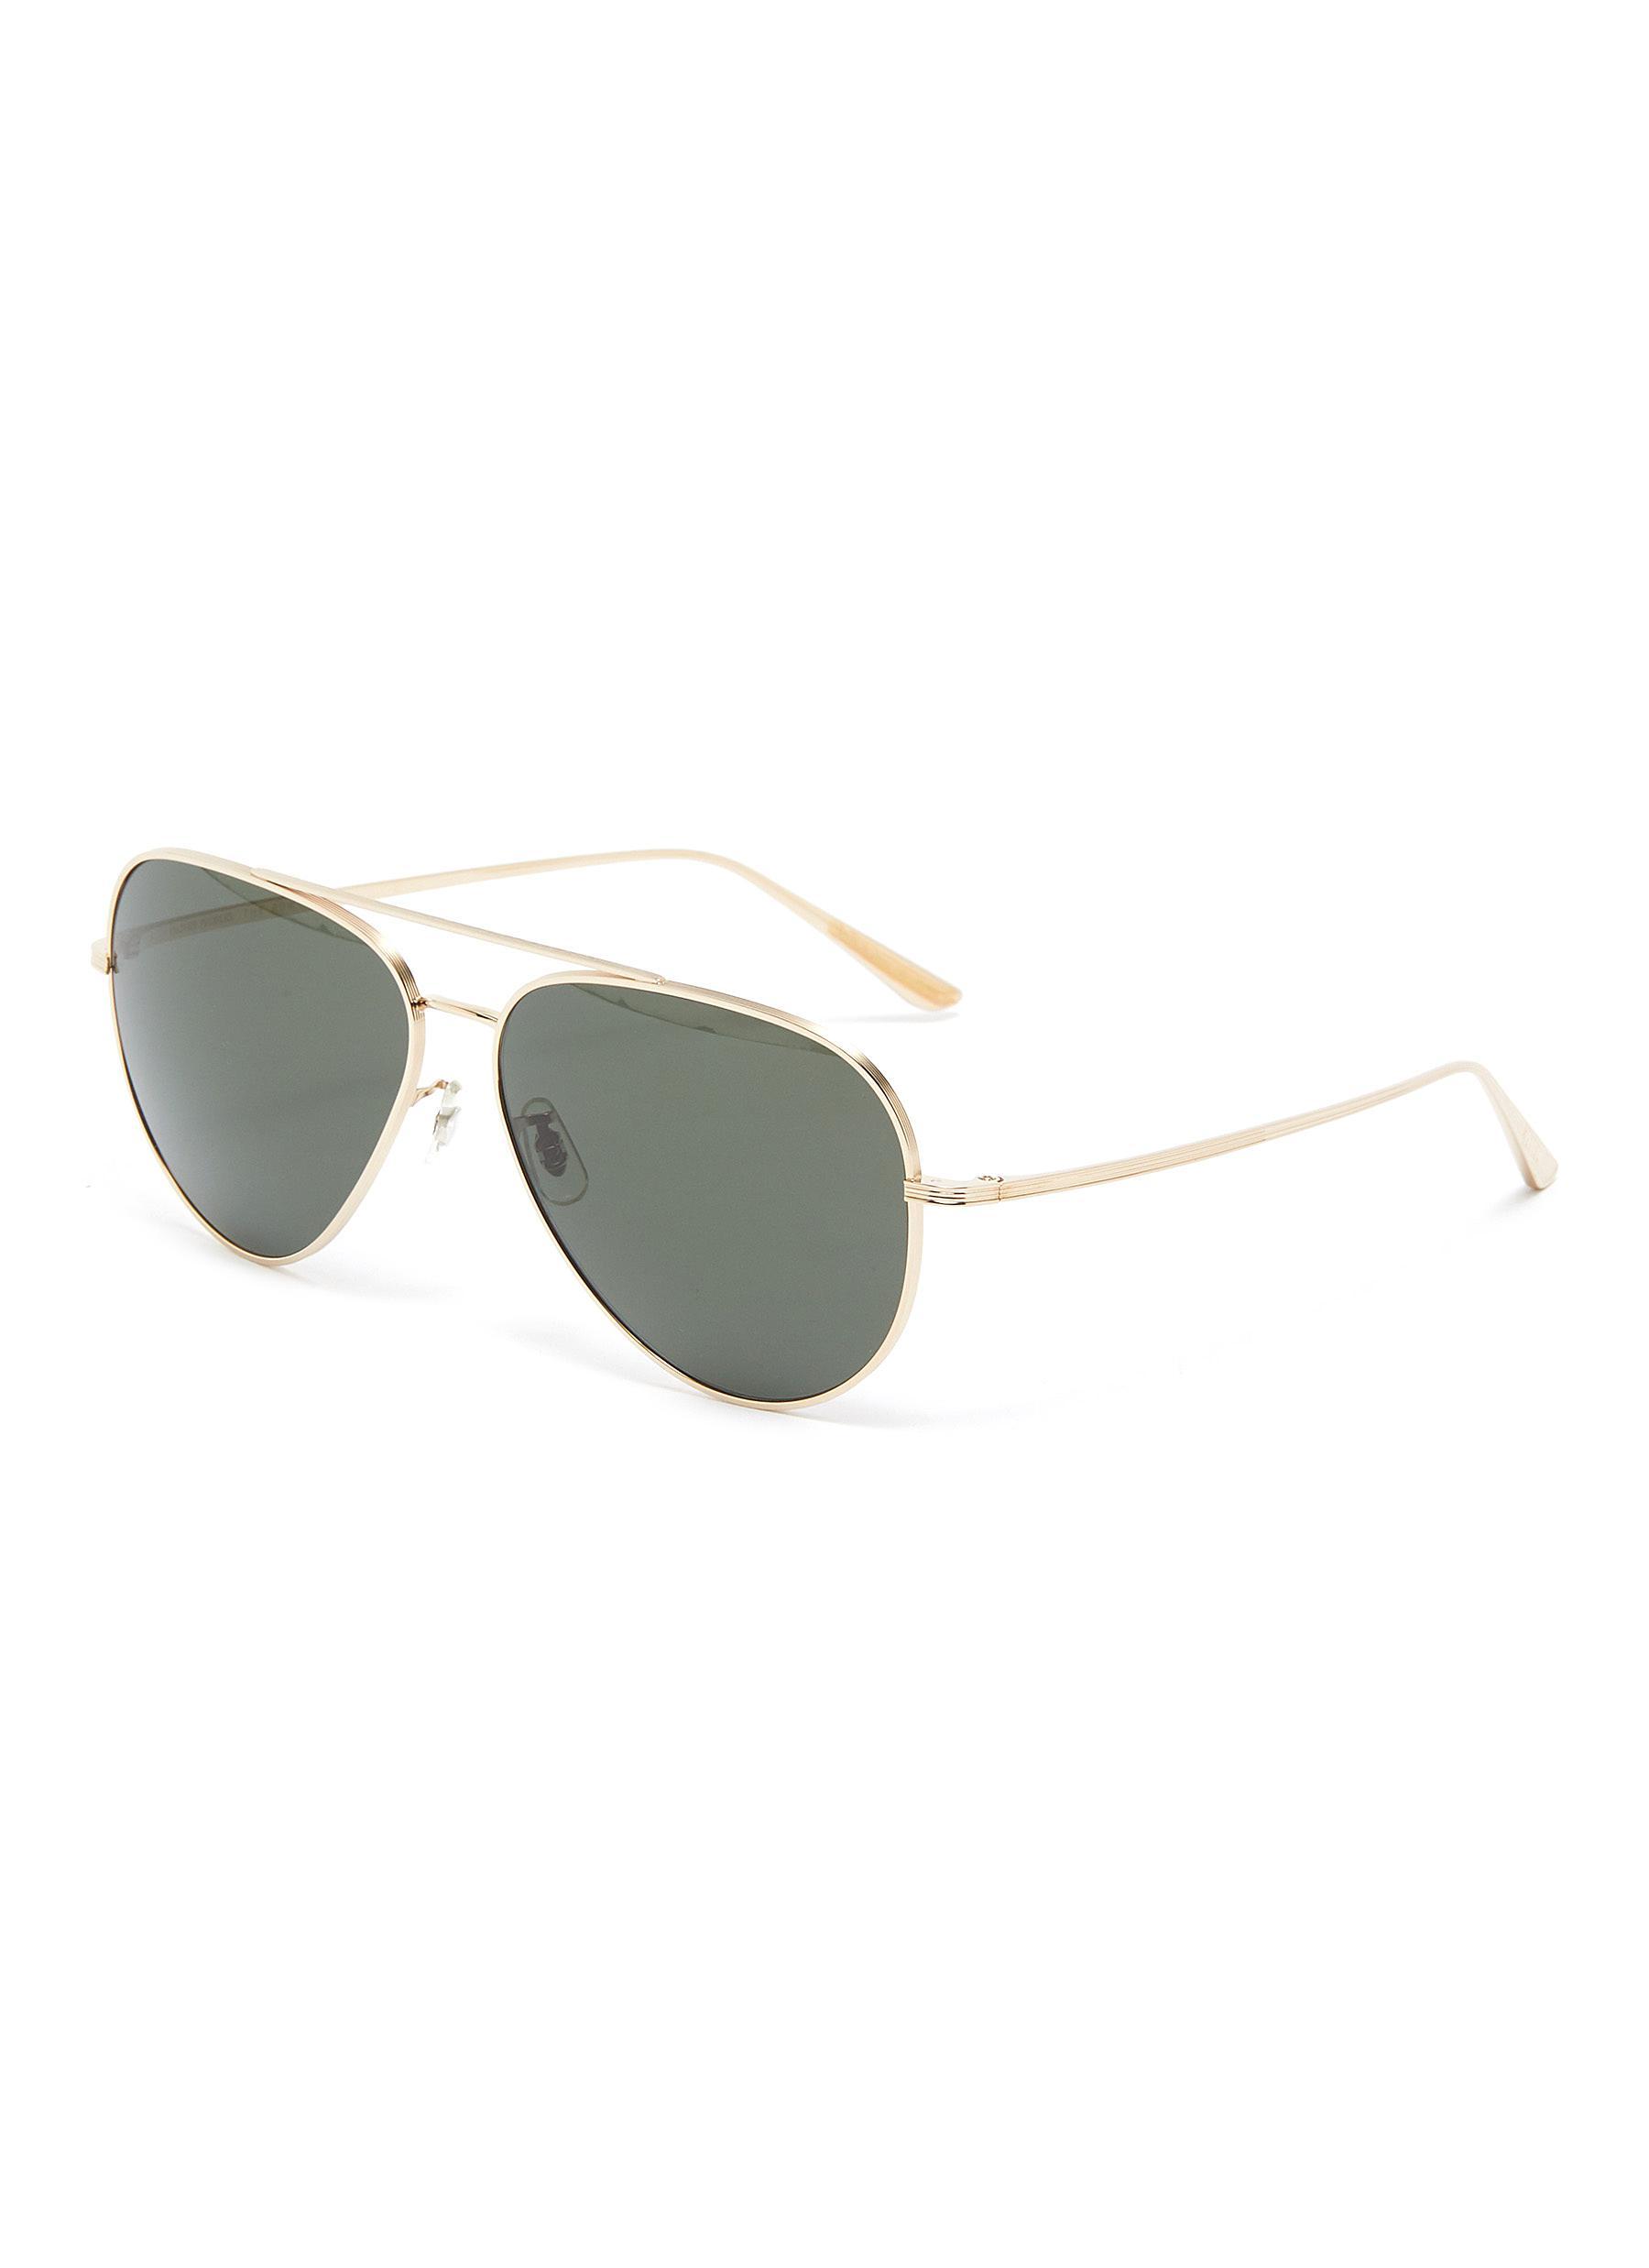 X The Row 'CASSE' Teardrop Sunglasses - OLIVER PEOPLES ACCESSORIES - Modalova